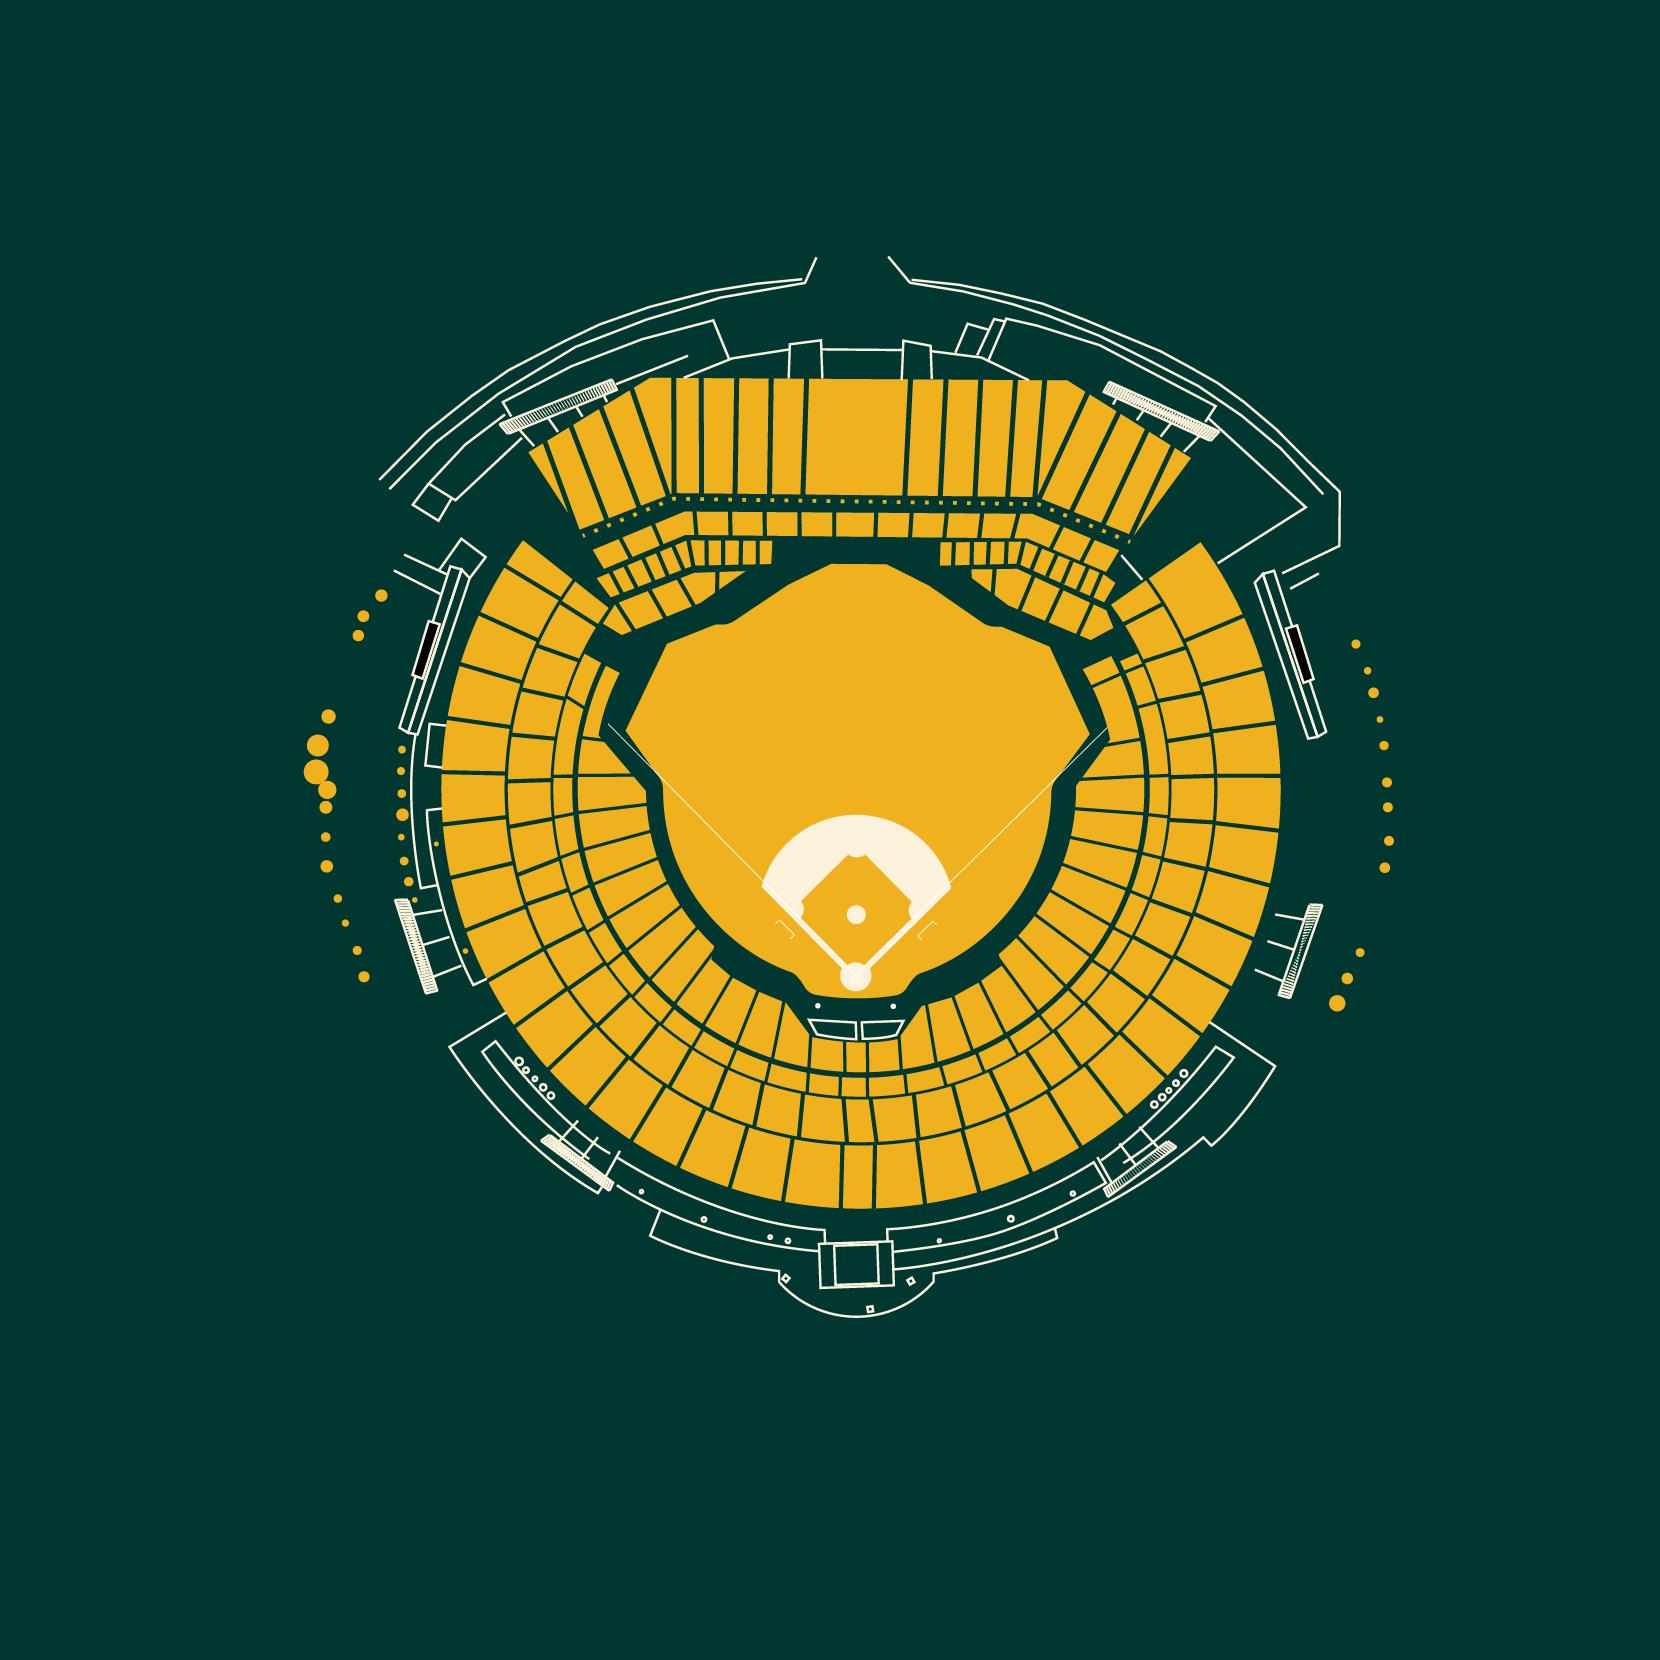 23 Oakland lameda County Coliseum Oakland Athletics.png